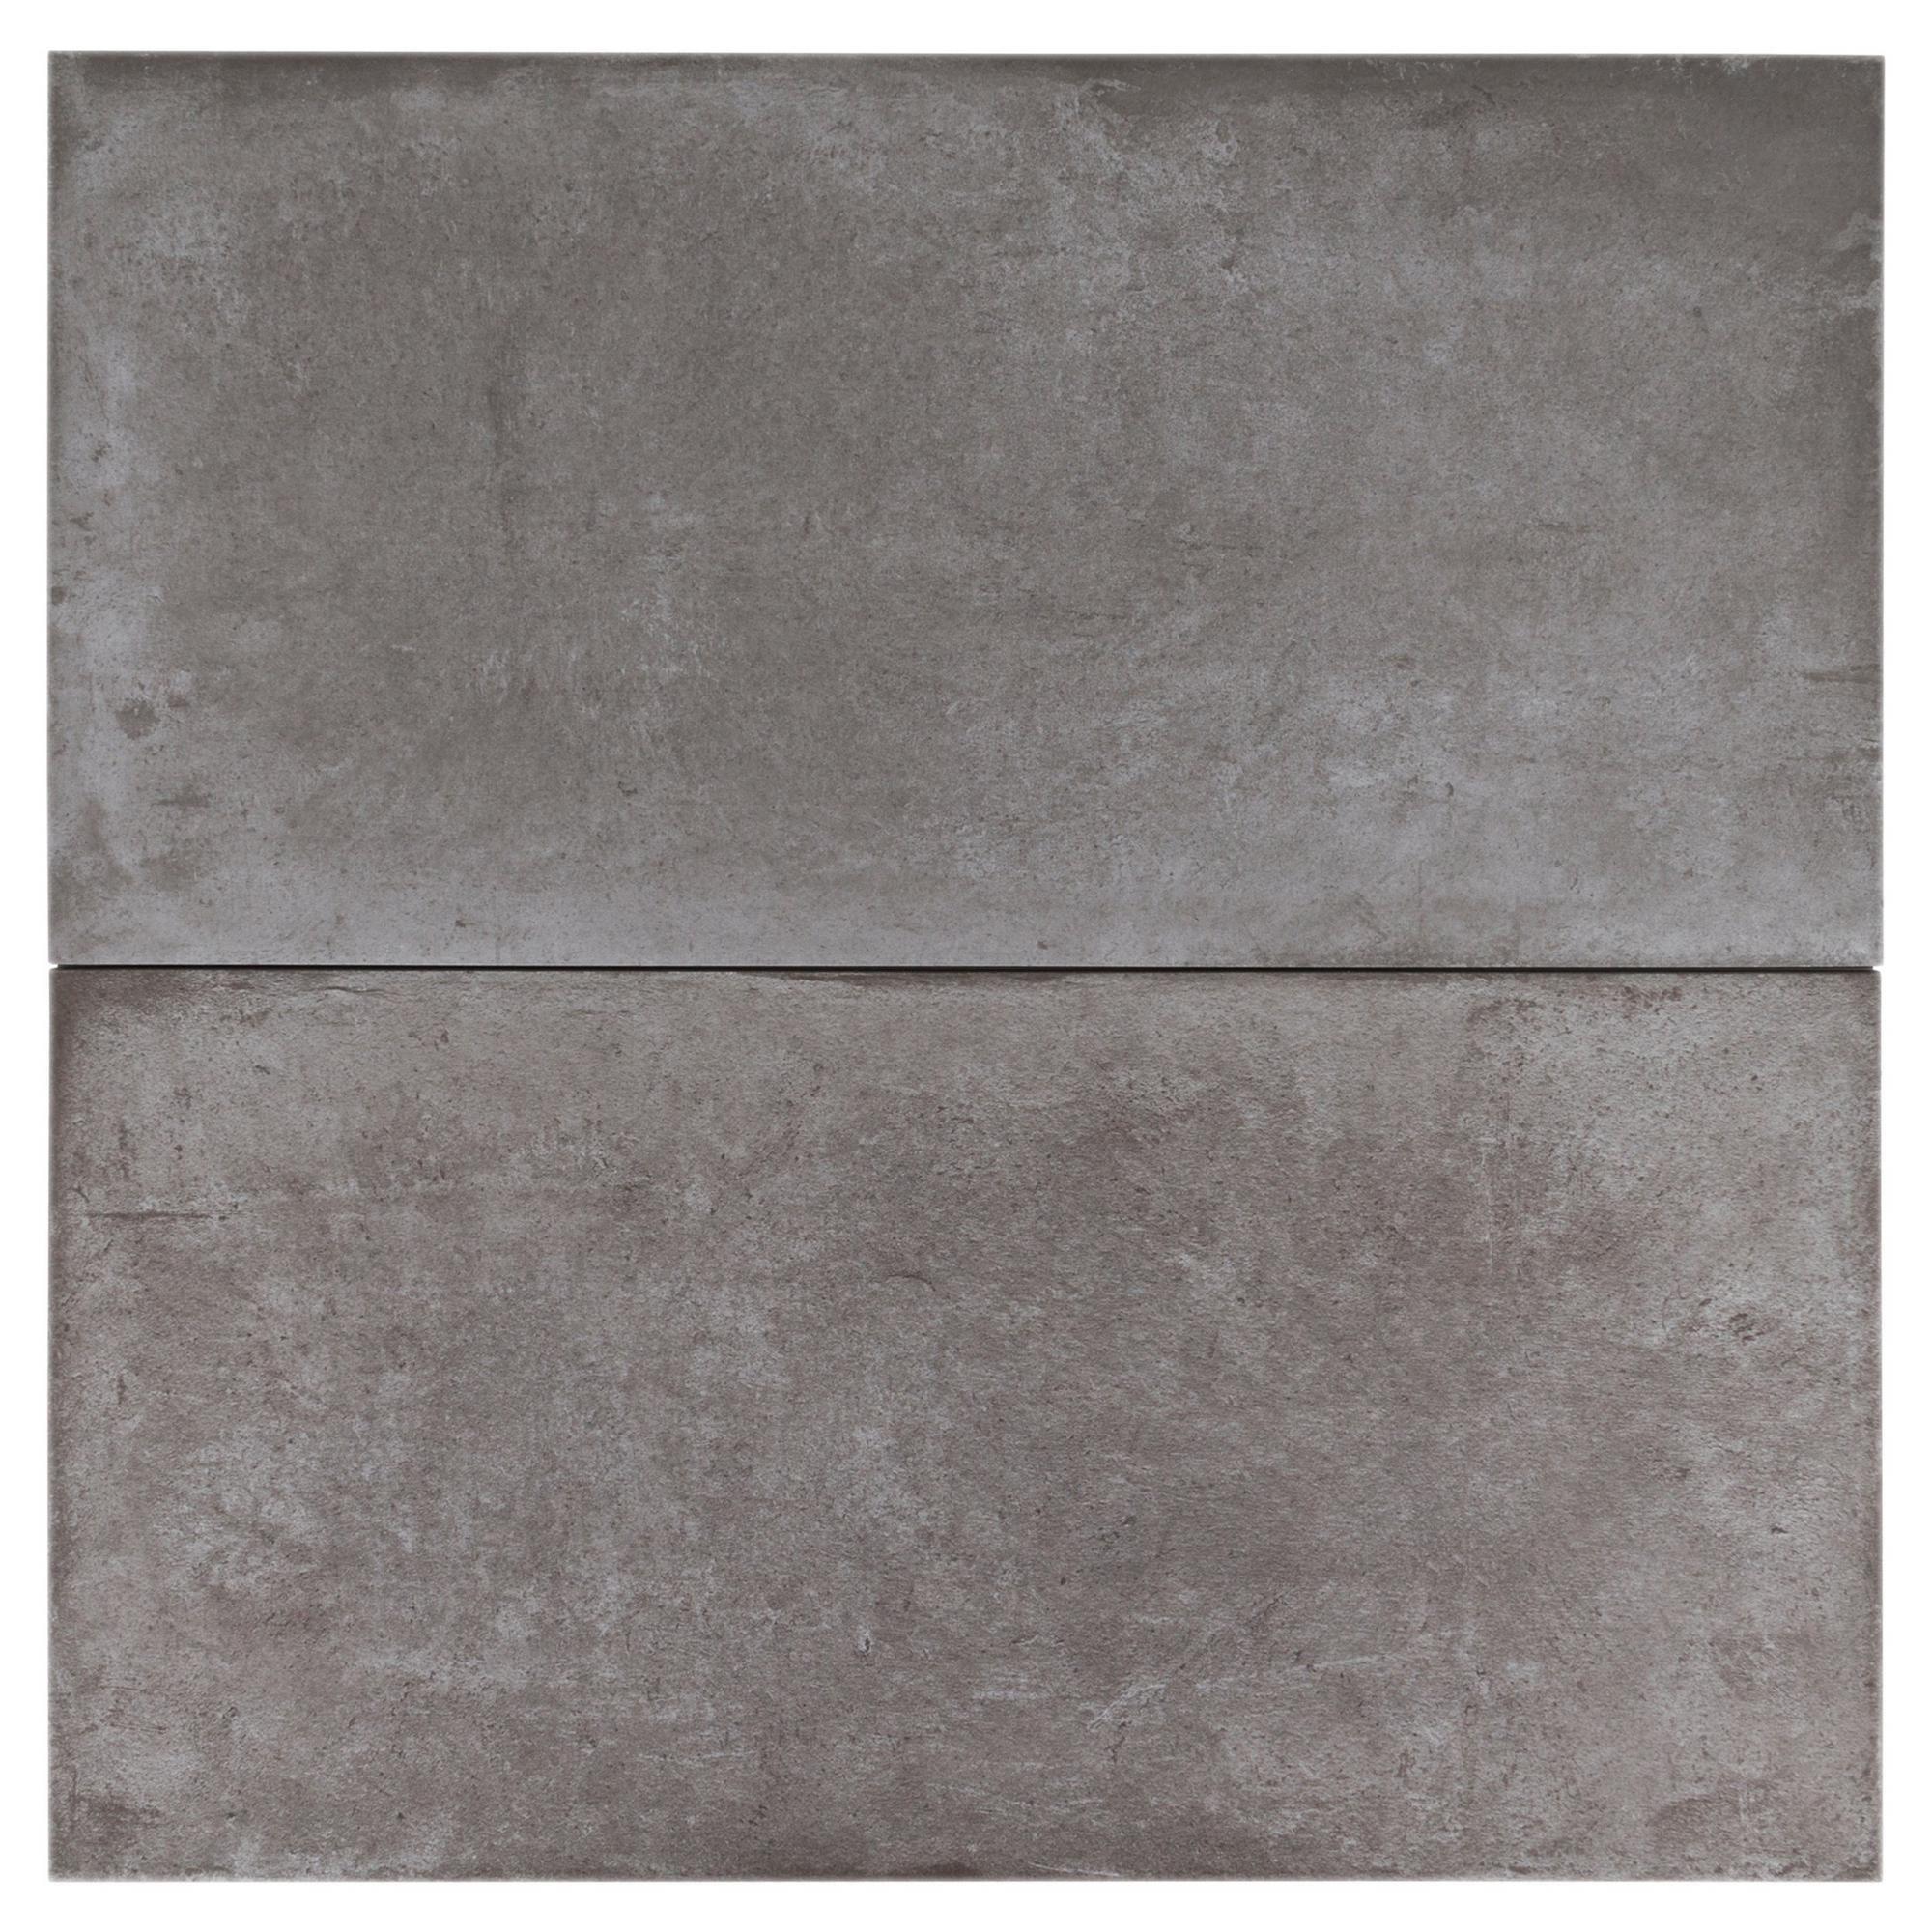 Large format tile floor decor crf pinterest large format large format tile floor decor groutporcelain dailygadgetfo Images